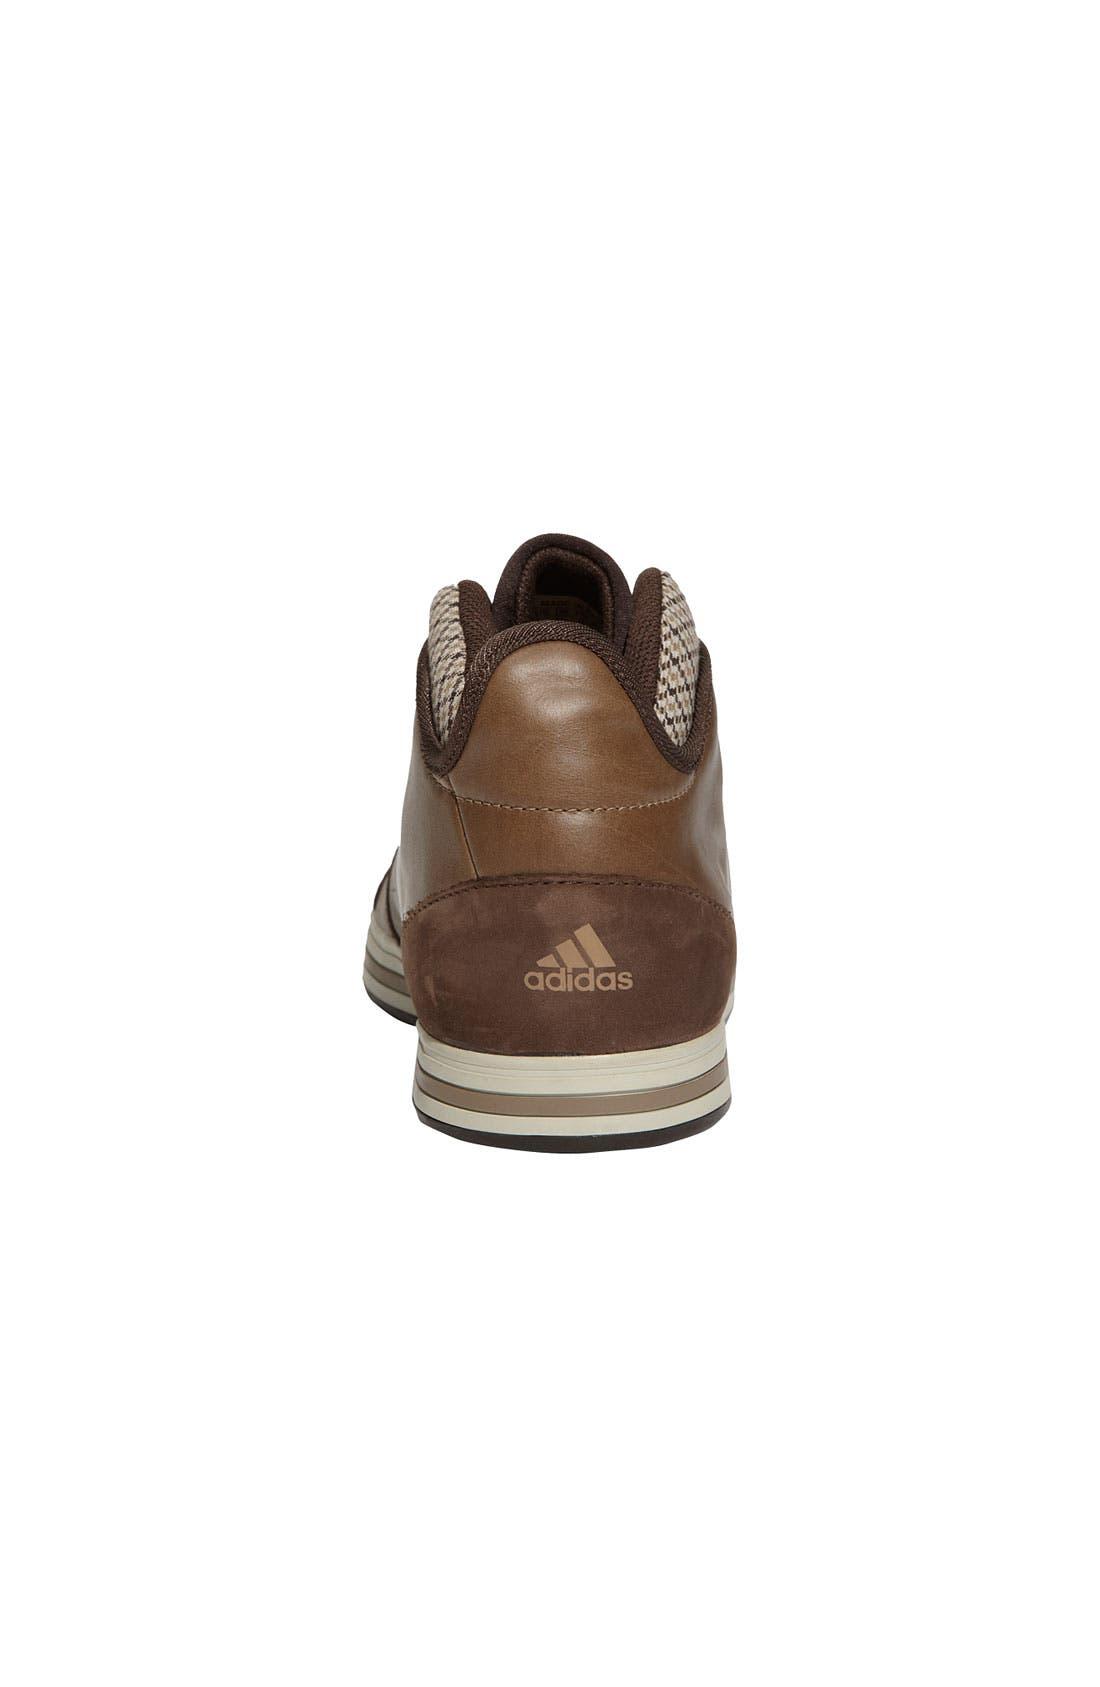 'Zeitfrei Mid' Sneaker,                             Alternate thumbnail 4, color,                             200